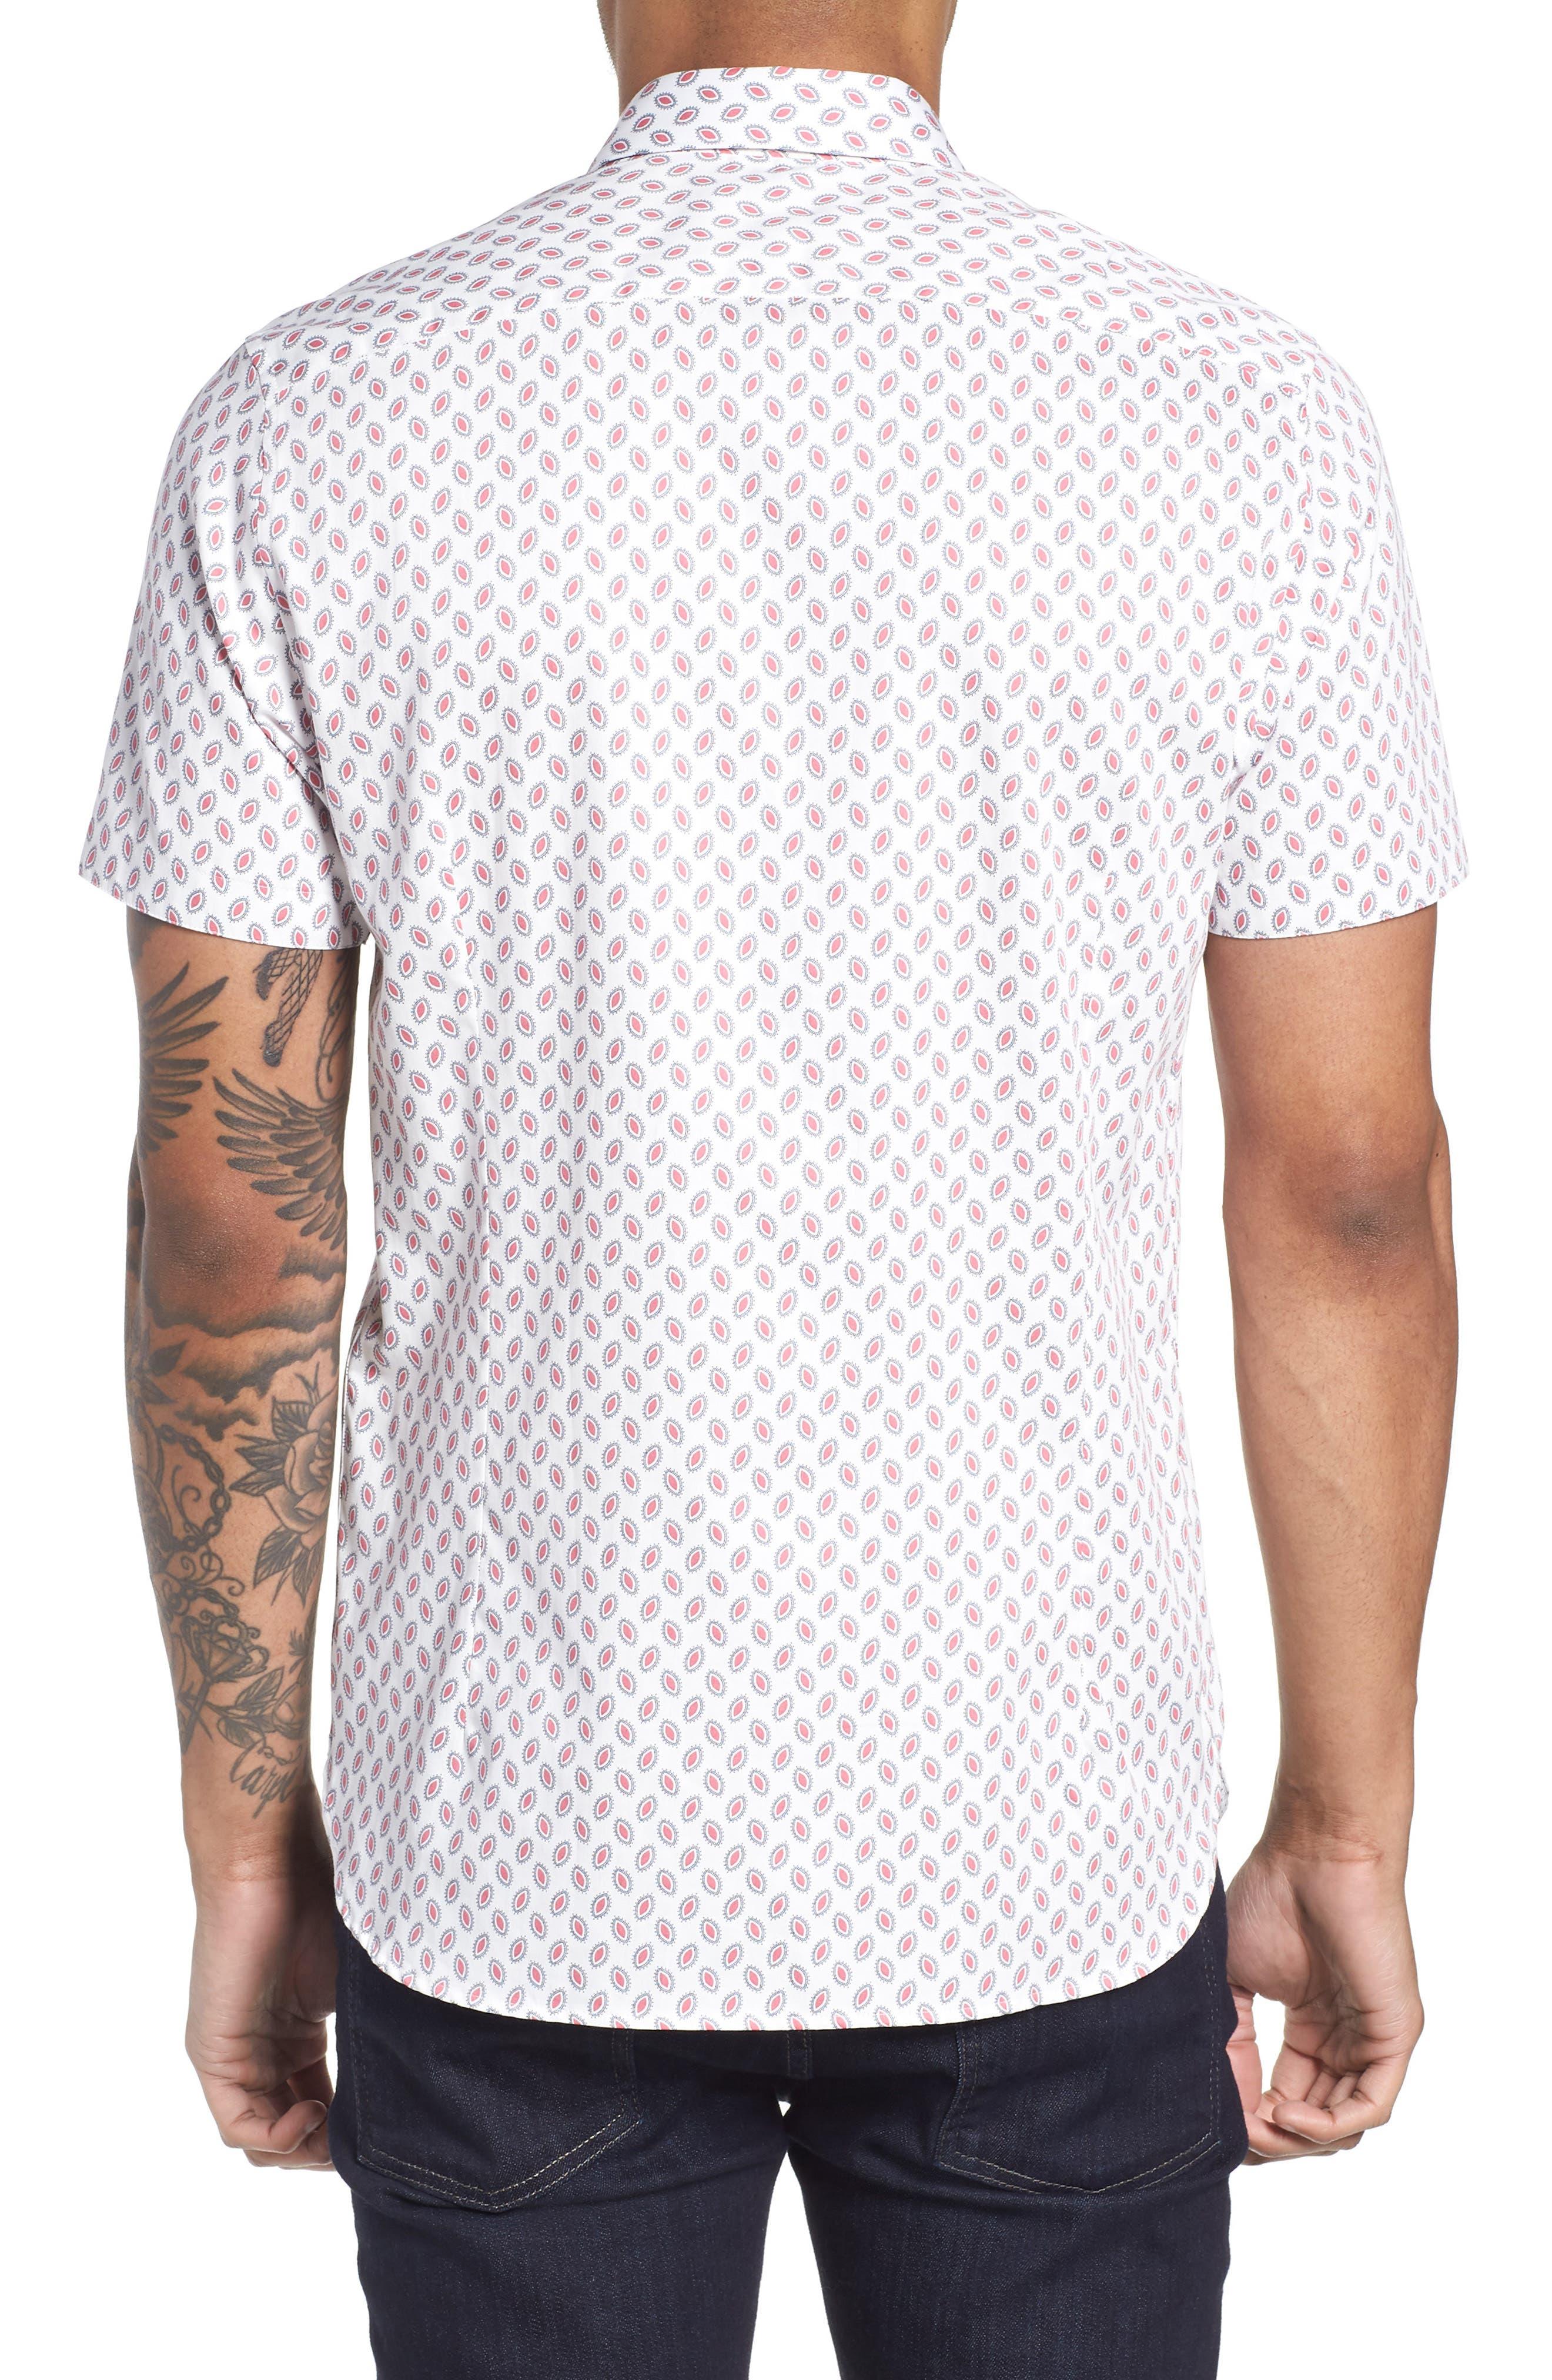 Newfone Trim Fit Chambray Sport Shirt,                             Alternate thumbnail 8, color,